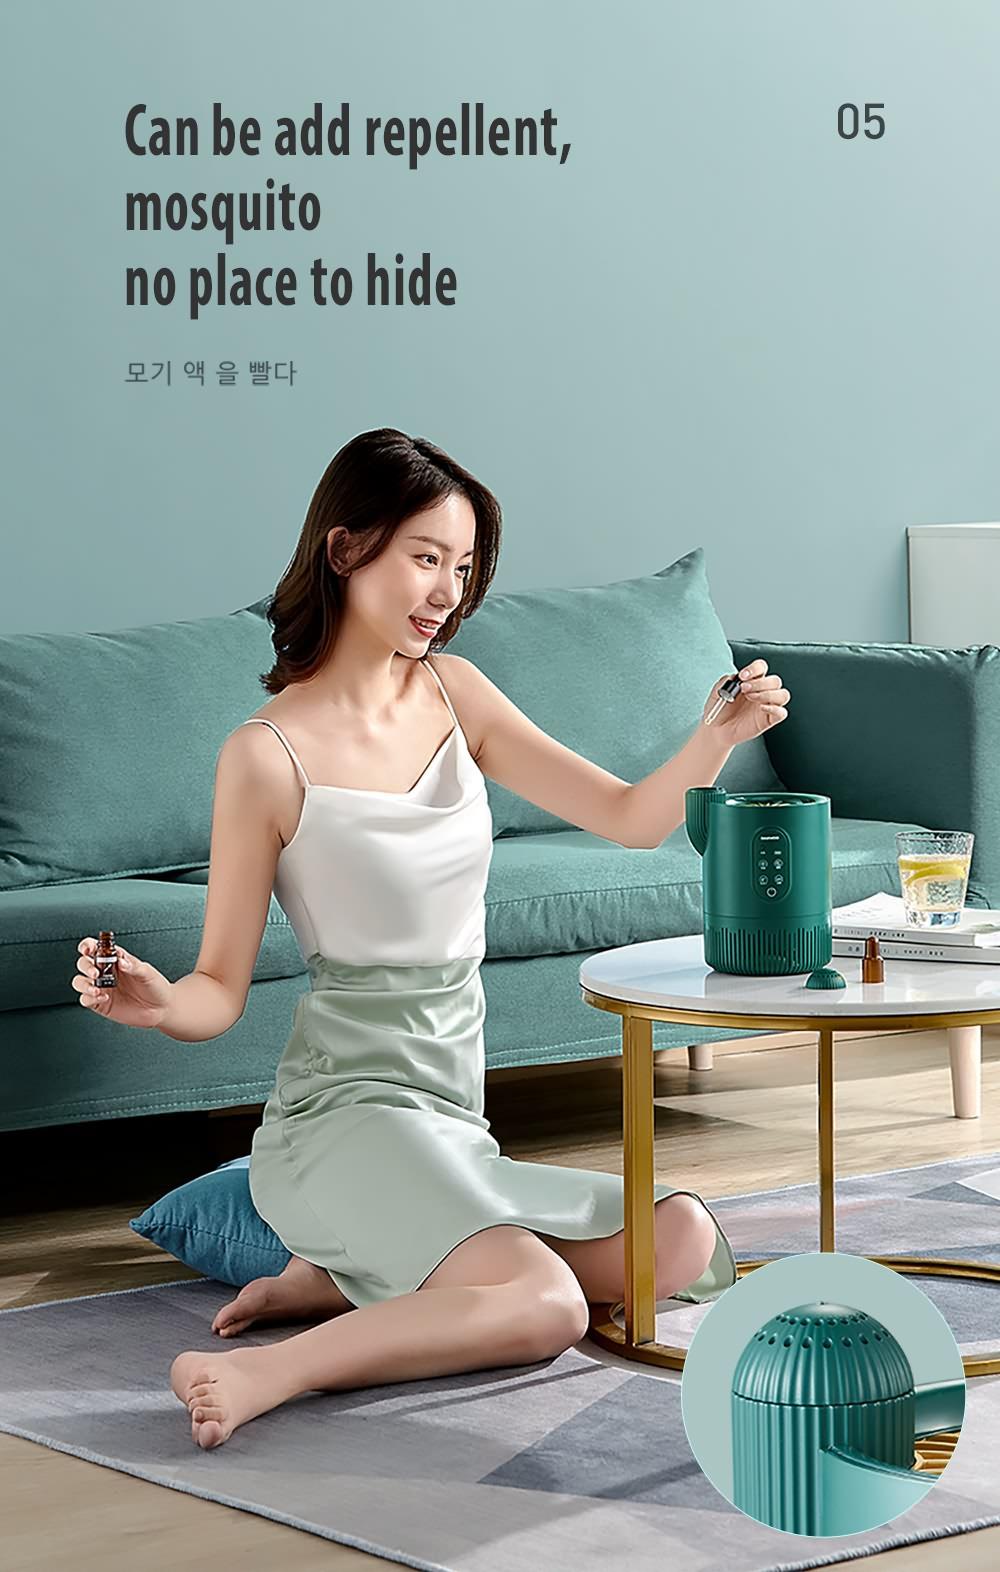 Mosquito-Killing Lamp (5)